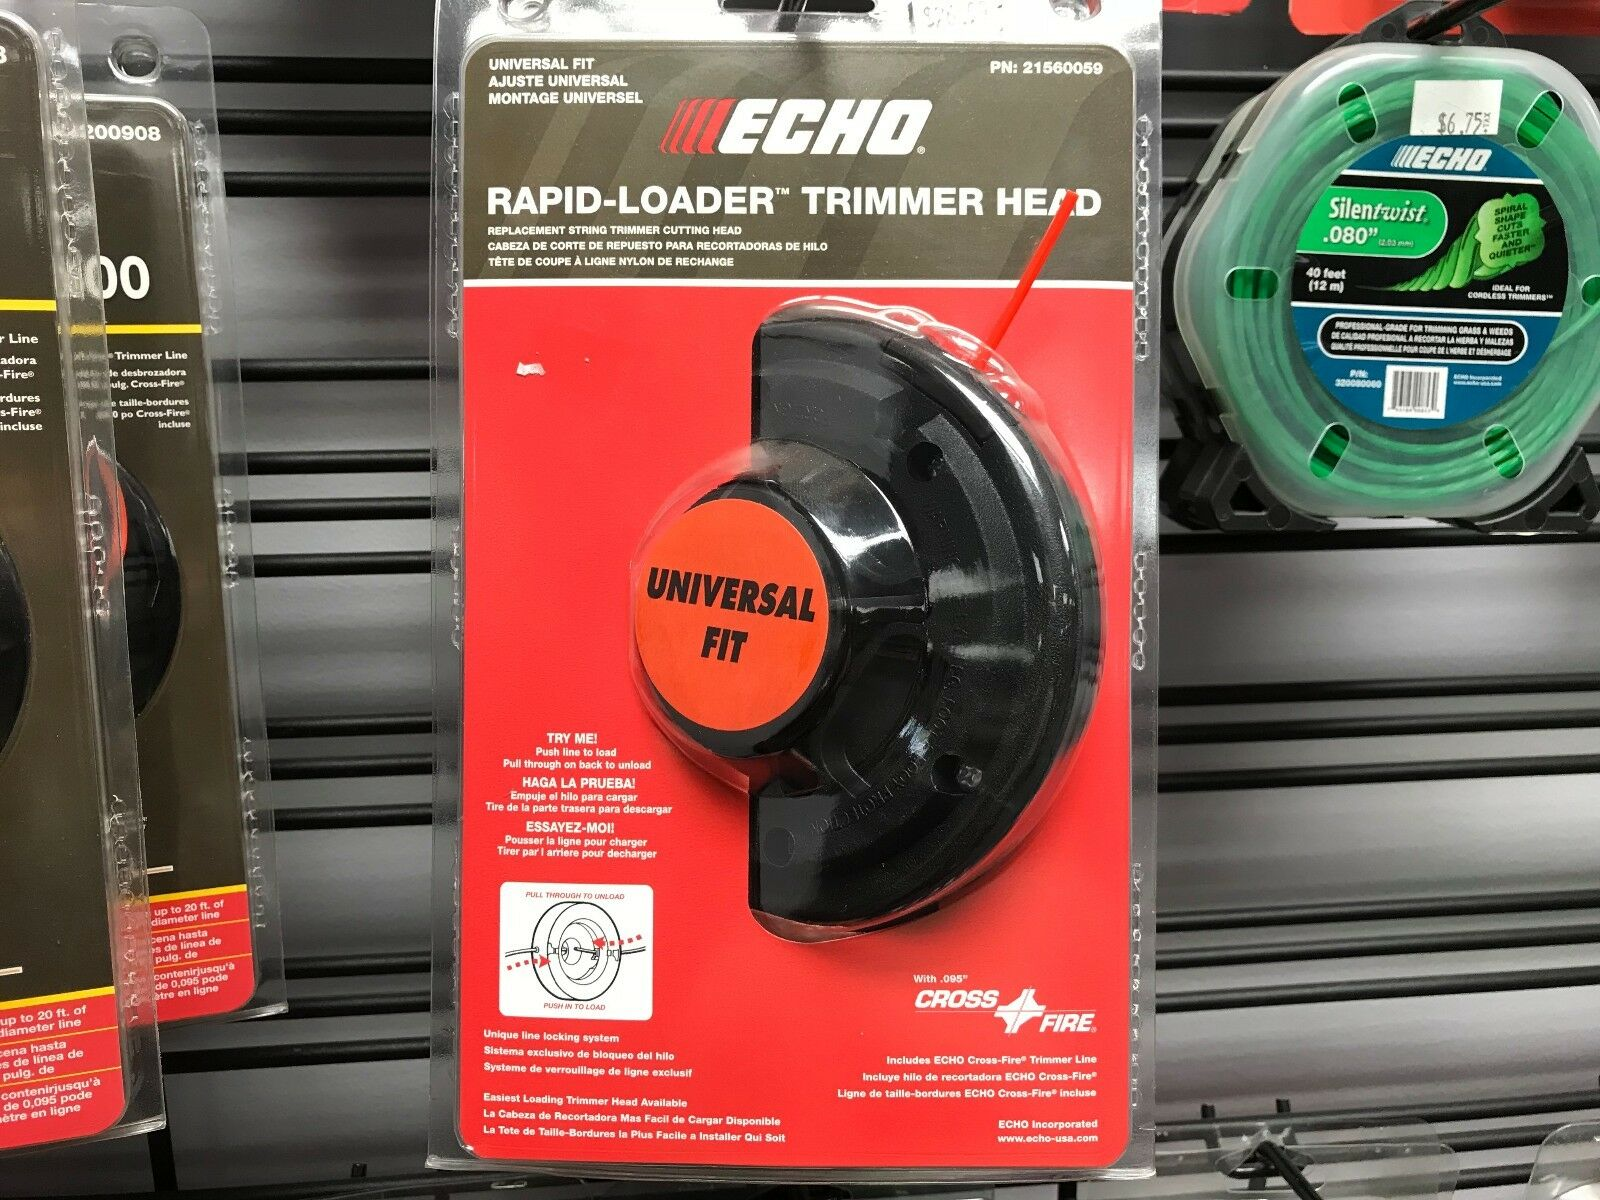 New Echo Universal Fit 3-Line Rapid Loader Head #99944200221